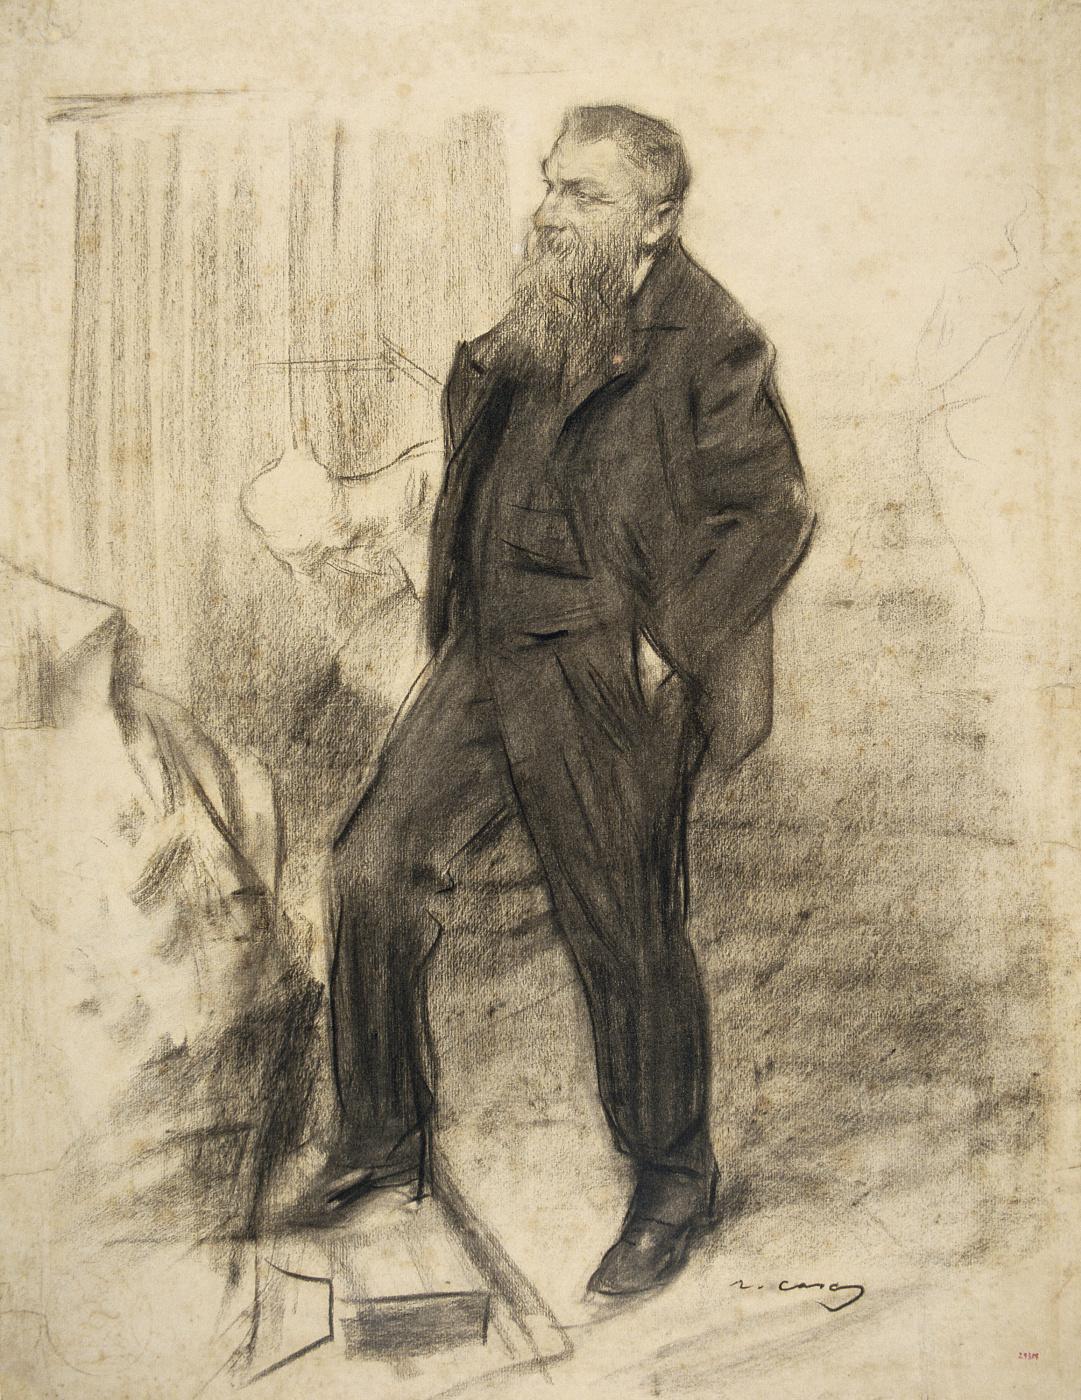 Ramon Casas i Carbó. Portrait of Auguste Rodin